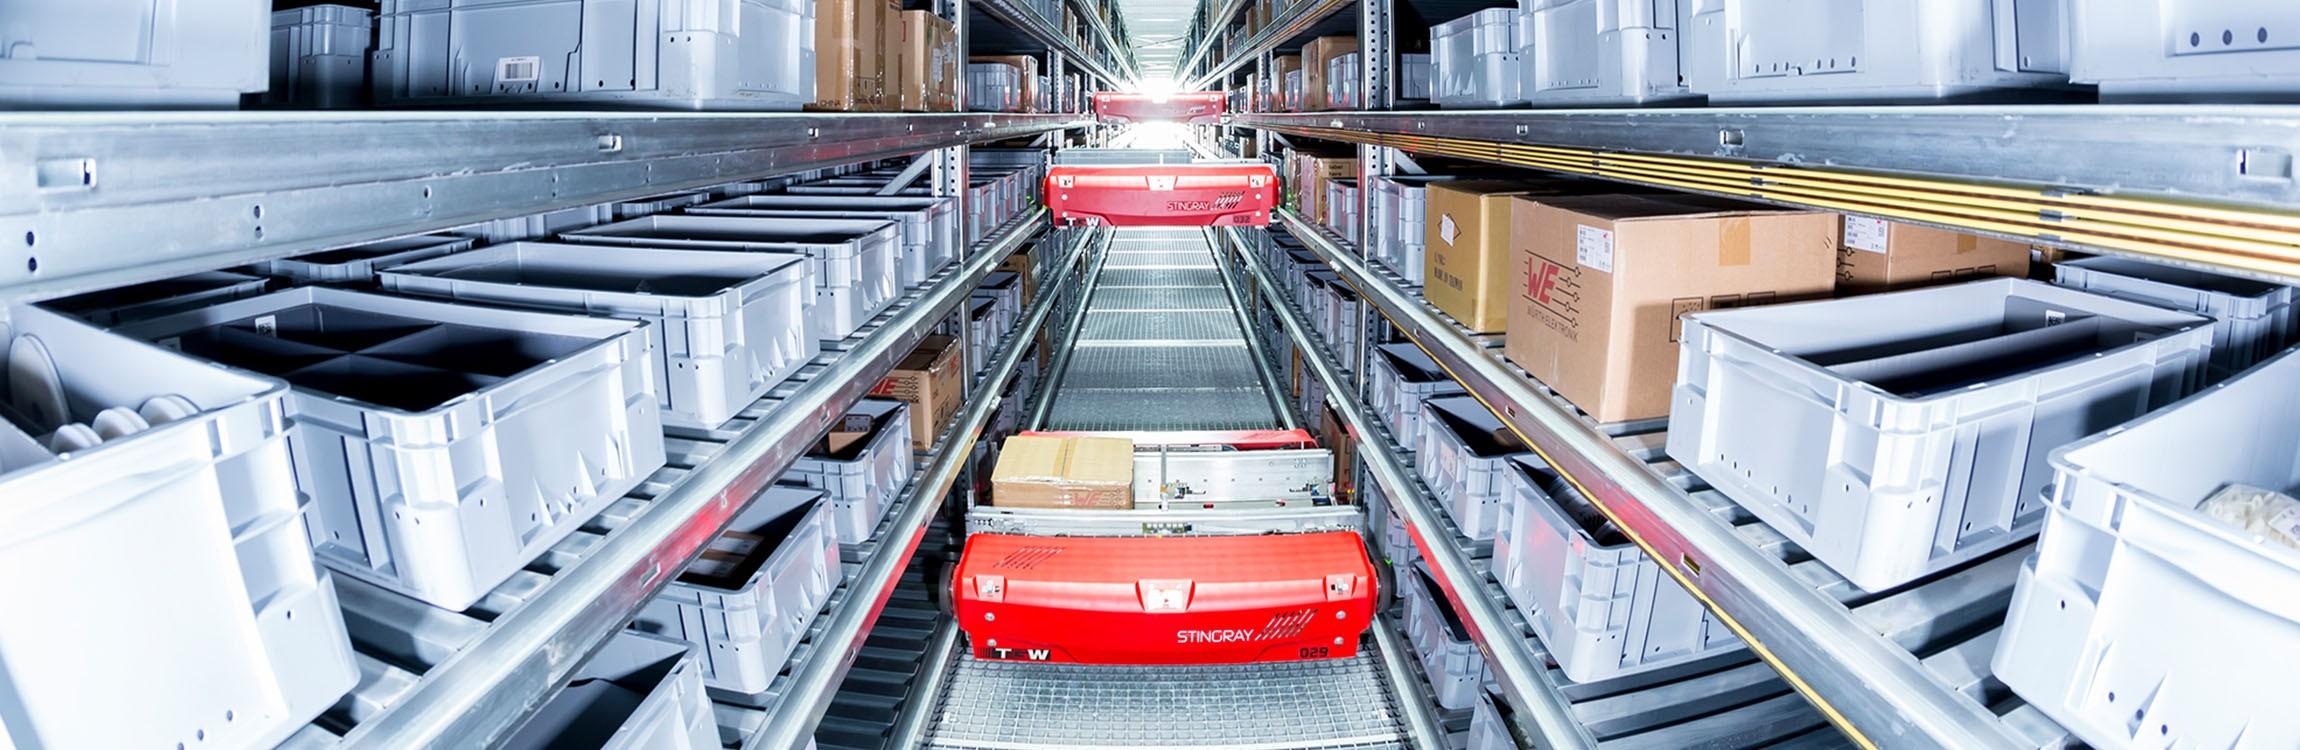 Highly dynamic logistics system.